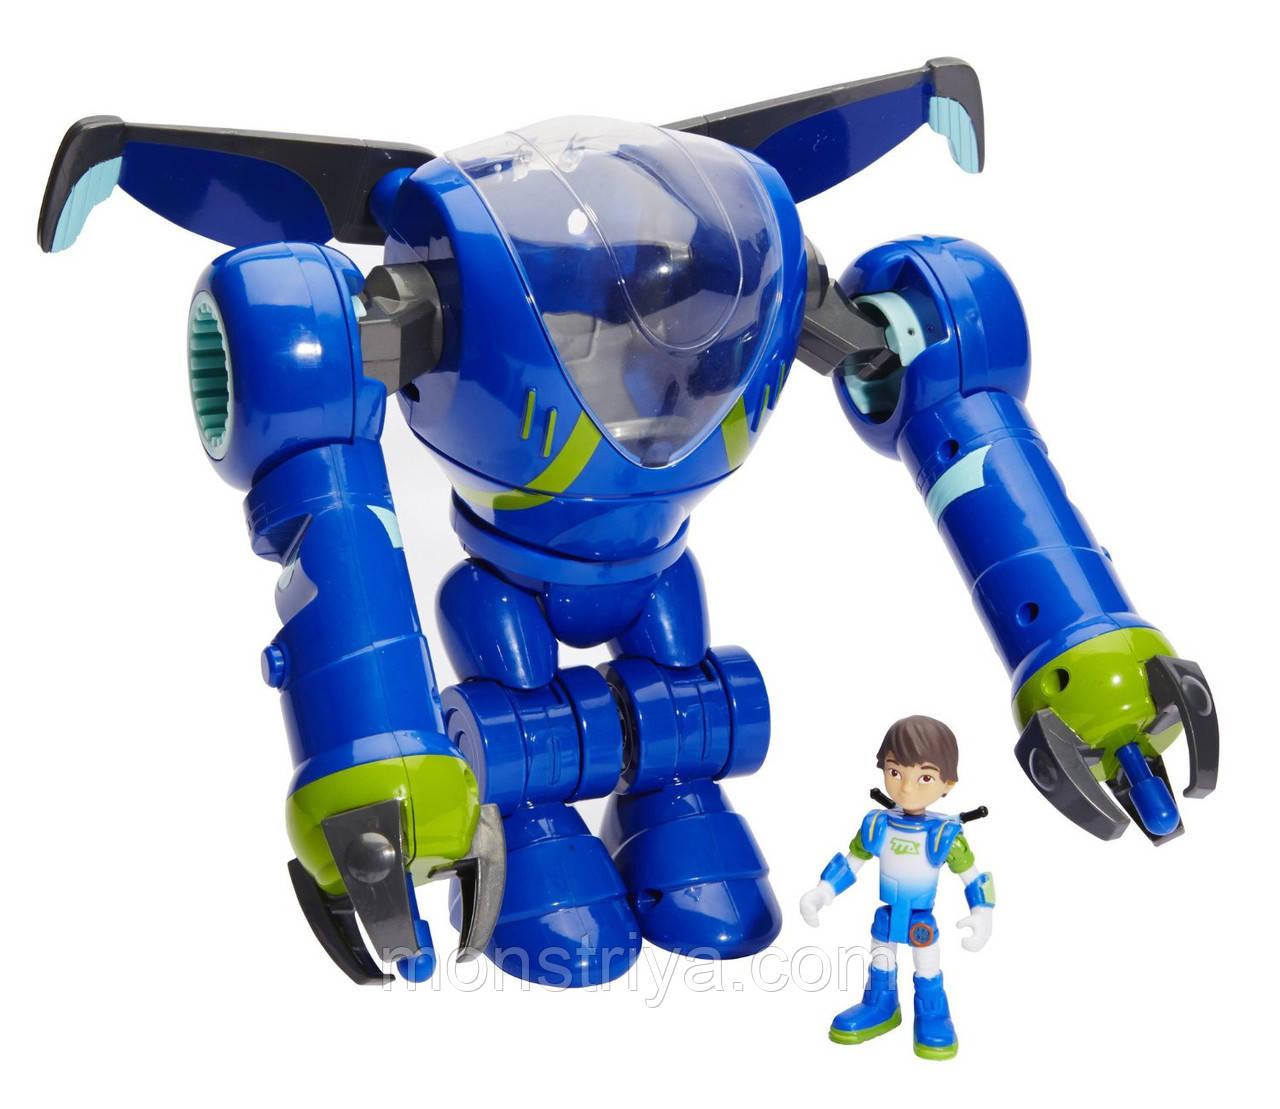 Игрушка Майлз с другой планеты. Межгалактический скафандр Экофлекс - скафандр Майлз